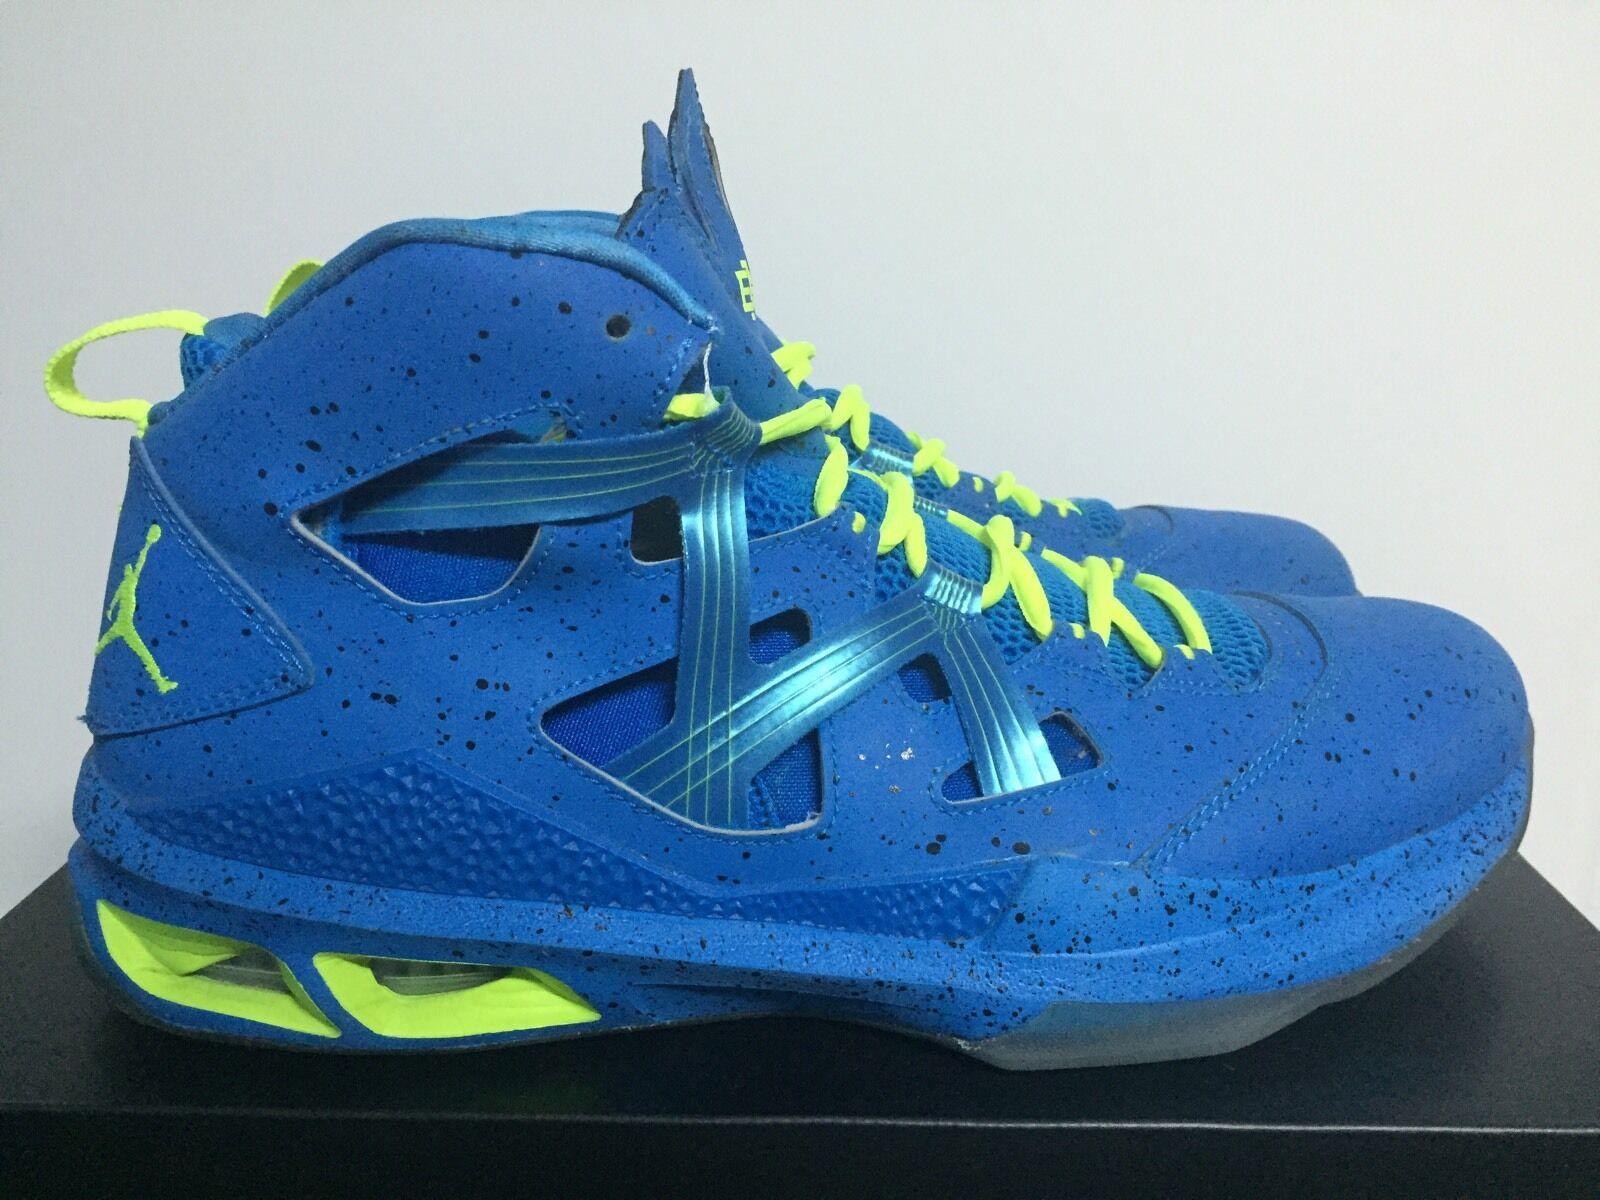 Nike US Jordan Melo 9 BHM US Nike 10,5 Kobe Hyper Max Curry Harden Lebron Kyrie KD CP3 b48ae4